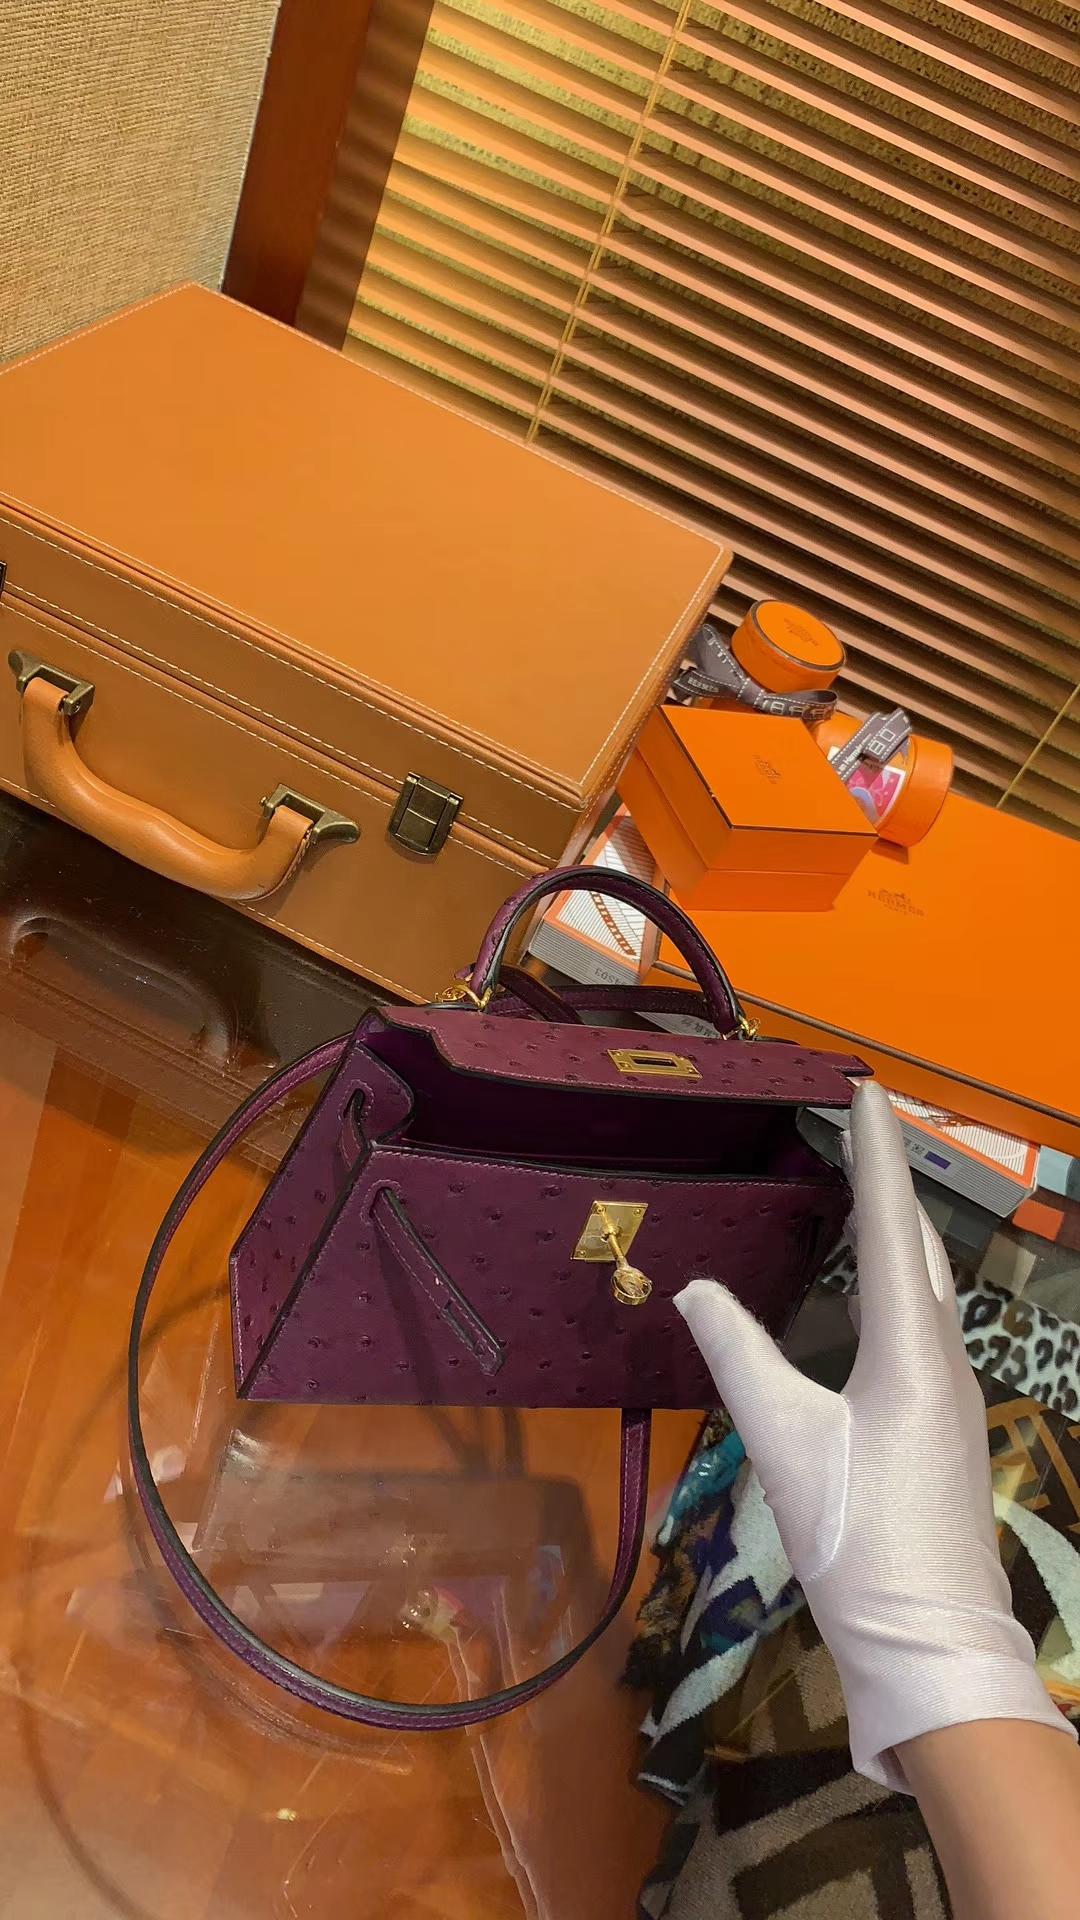 Hermès(爱马仕)迷你2代 mini Kelly 深紫色 南非KK鸵鸟 全手工缝制 19cm